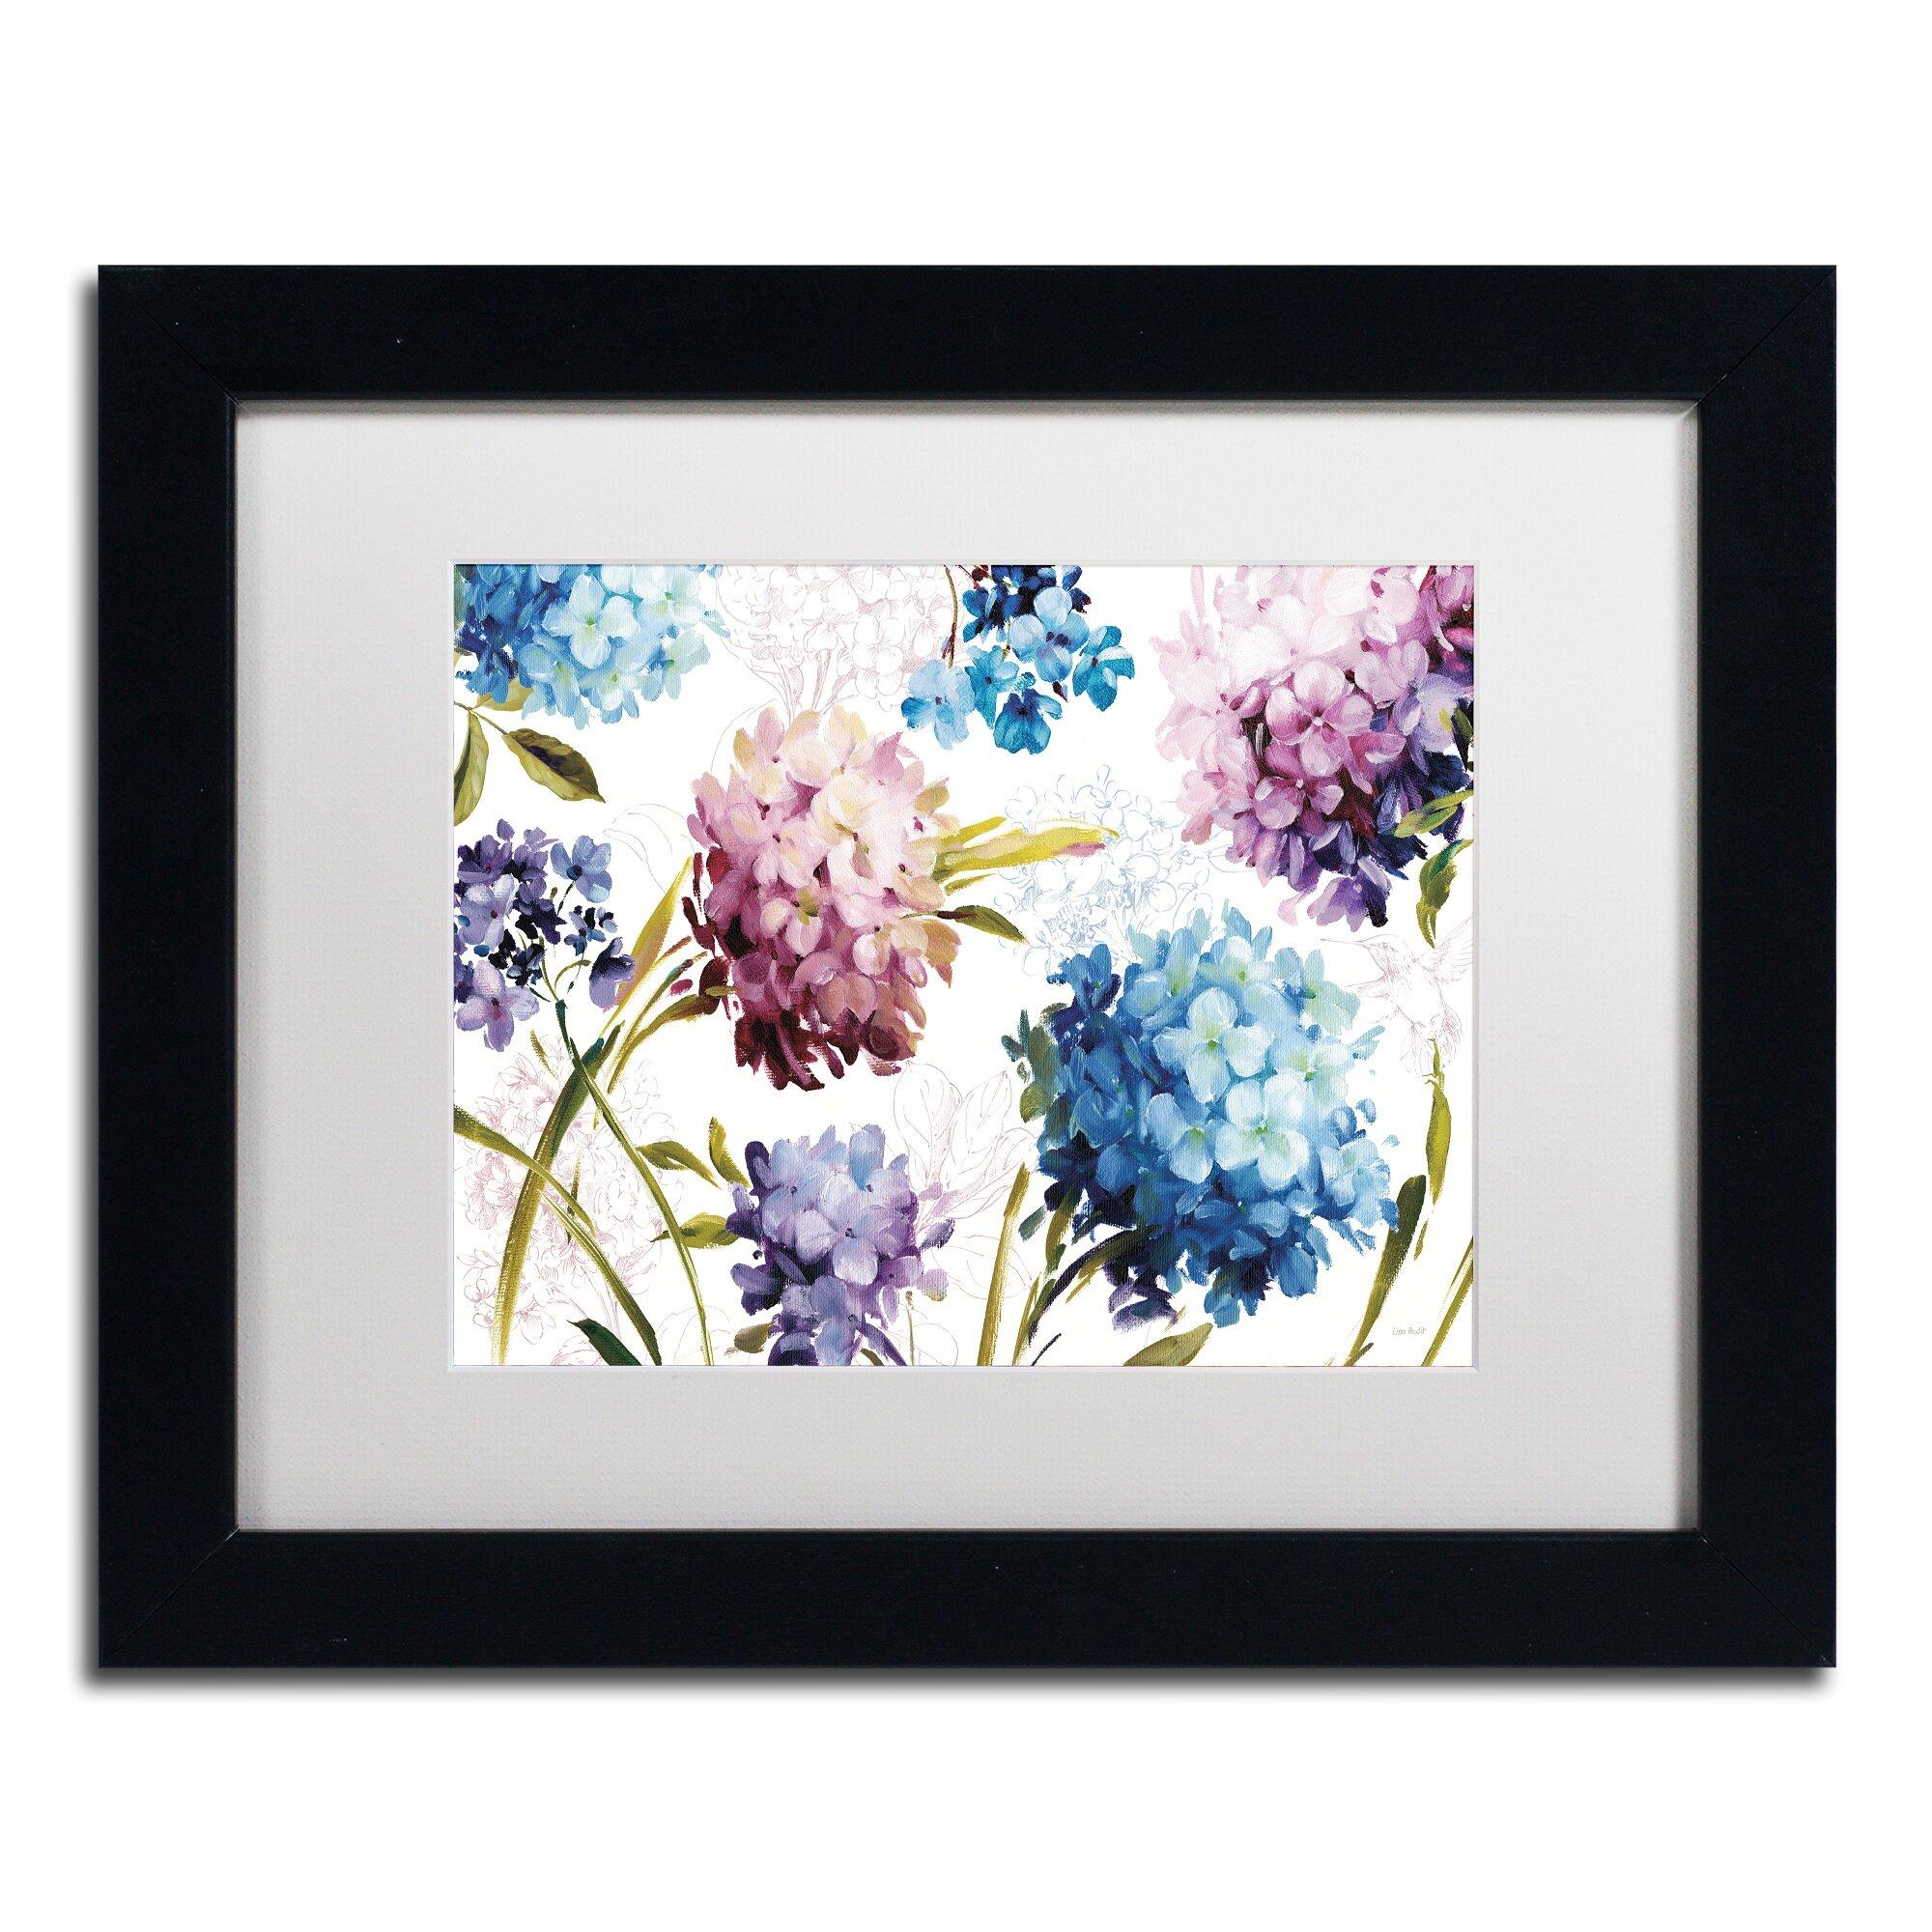 Trademark Art Spring Nectar I Laurie By Lisa Audit Framed Painting Print On Canvas Wayfair